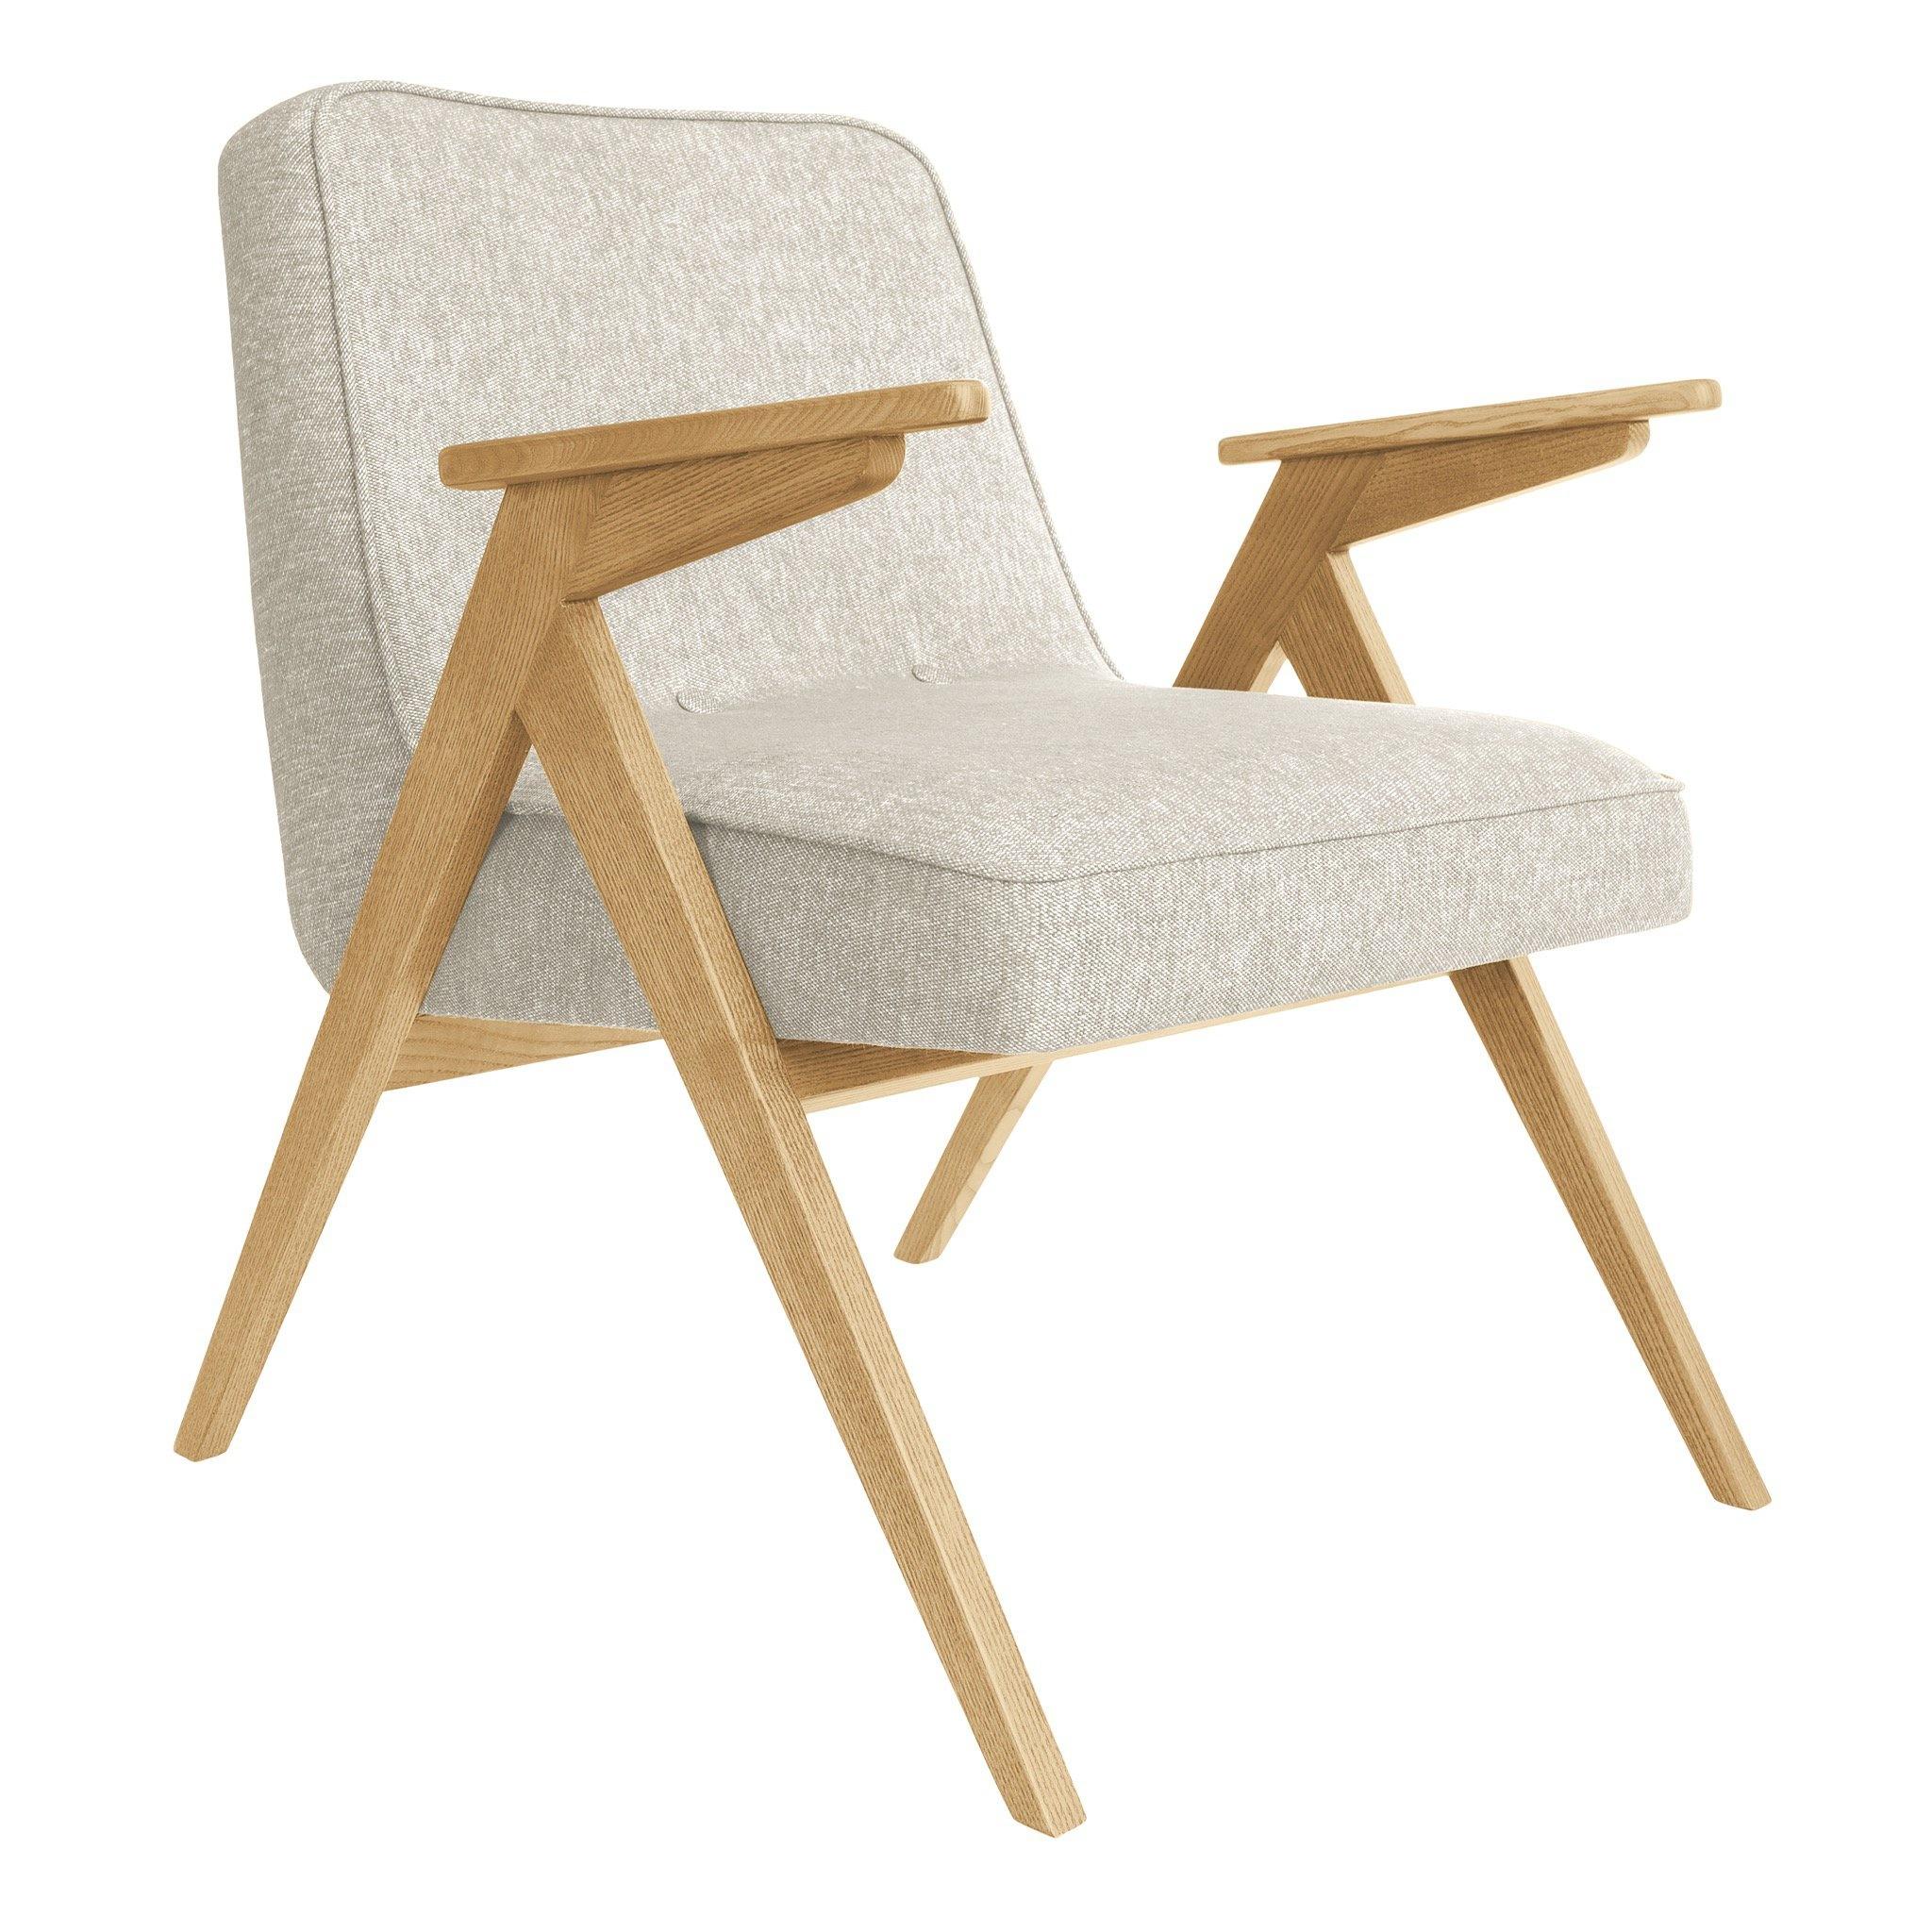 Swell 366 Meubels Design Online Concept Lounge Bunny Stoel Y6Fygb7V Creativecarmelina Interior Chair Design Creativecarmelinacom